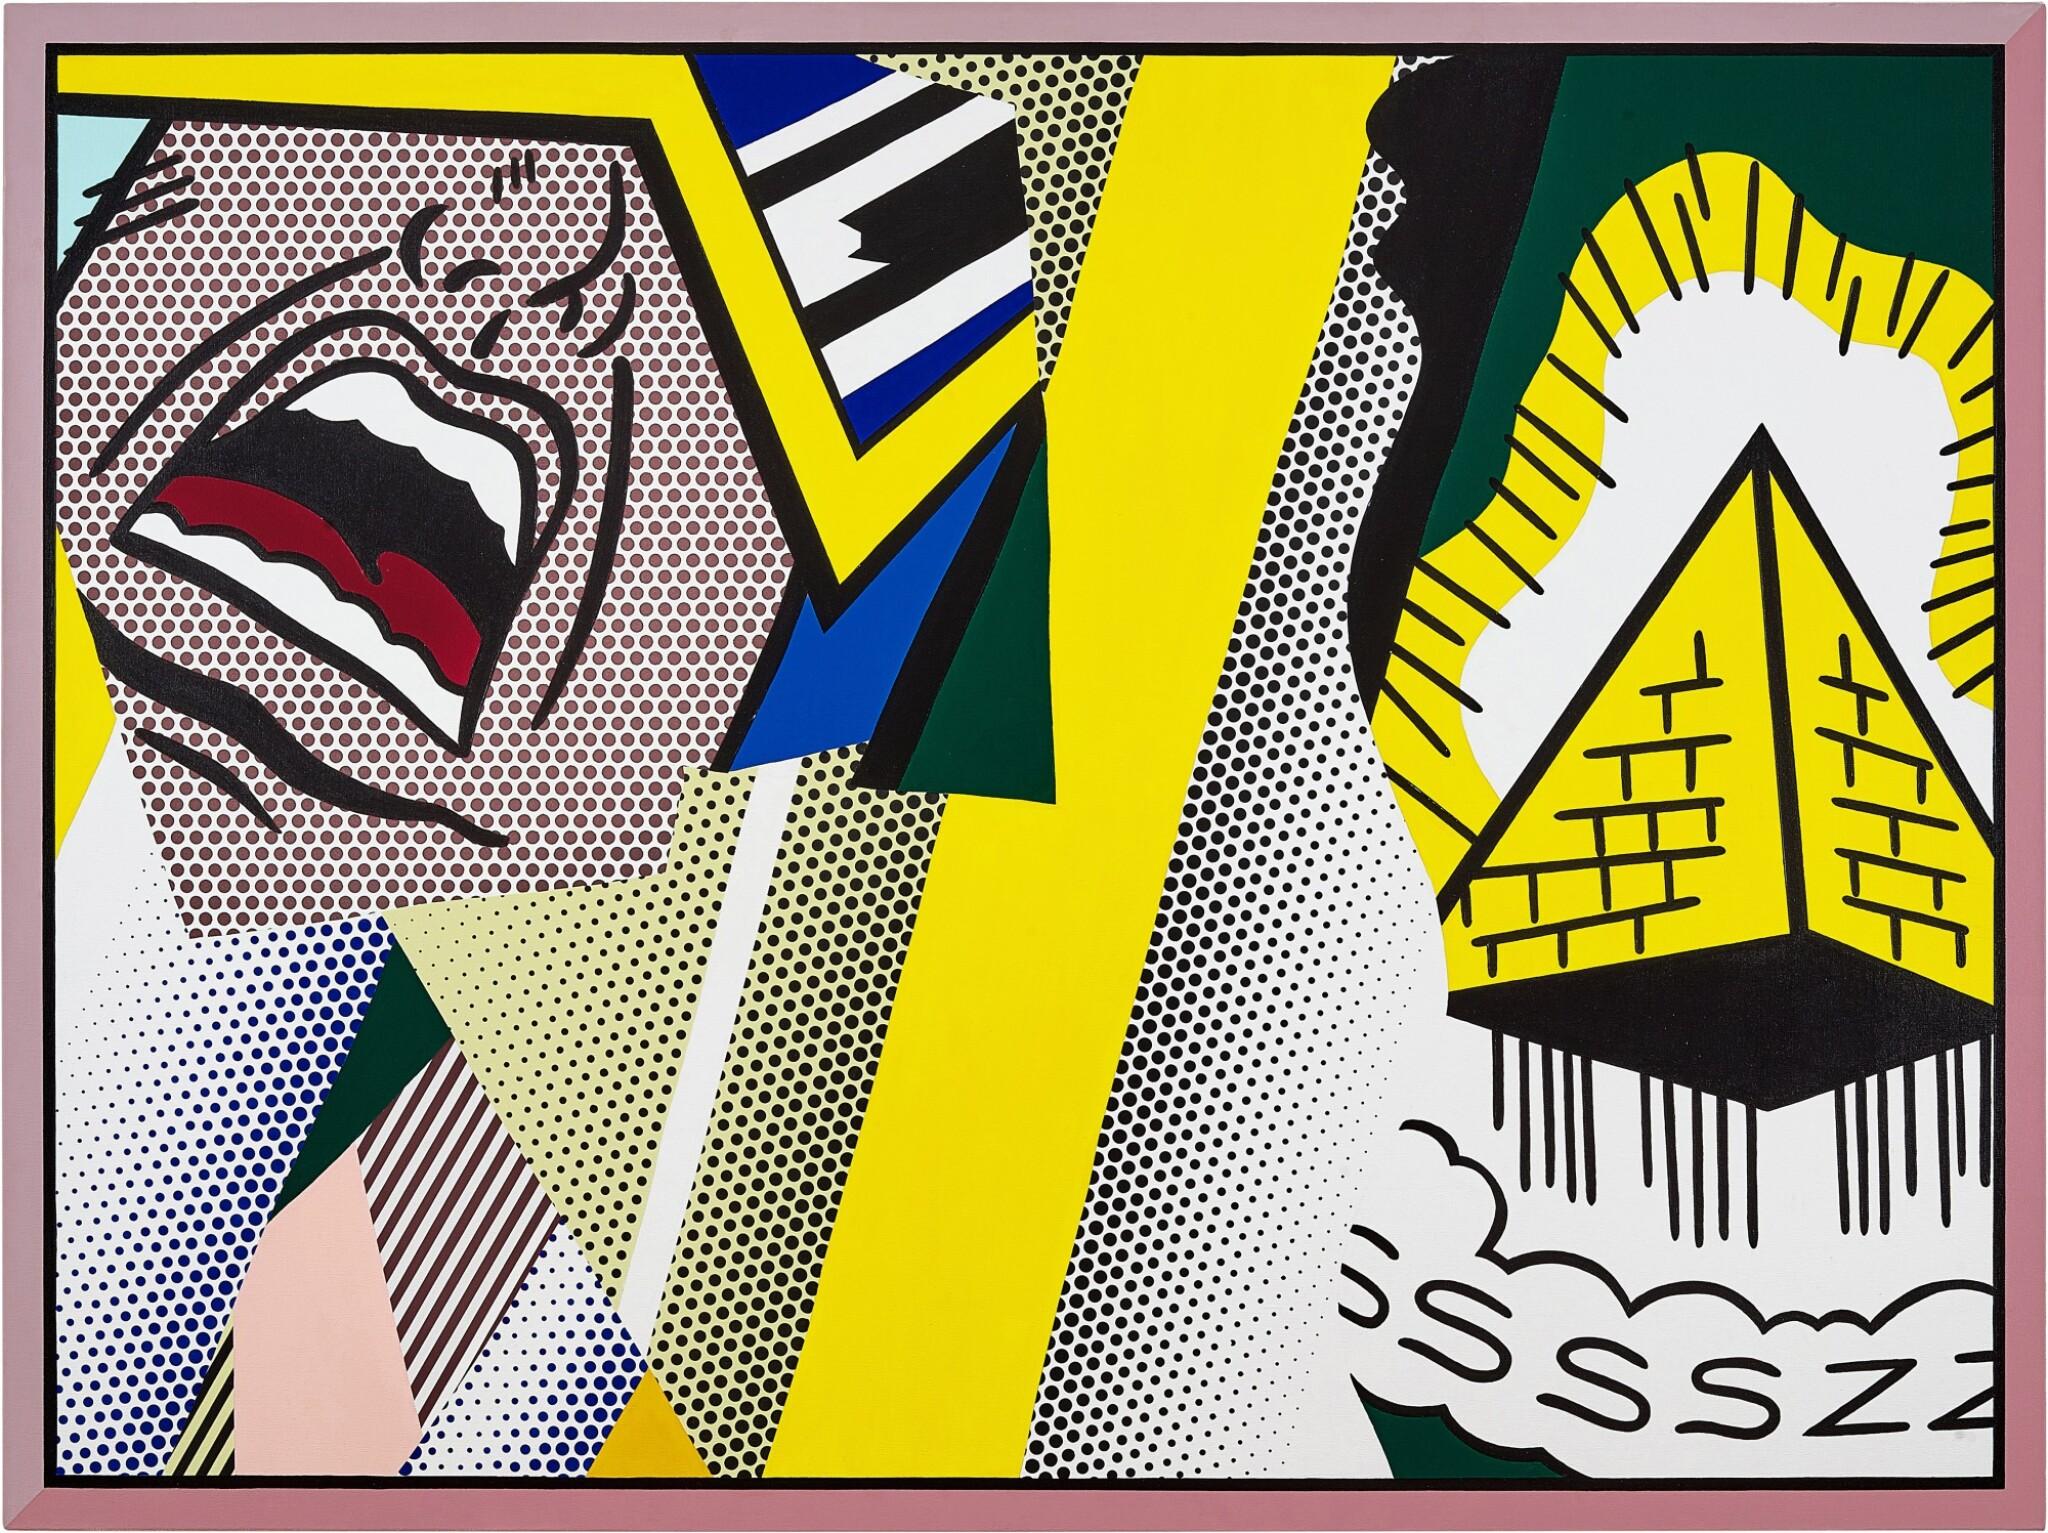 View full screen - View 1 of Lot 1117. Roy Lichtenstein 羅伊・李奇登斯坦 | Reflections: Mystical Painting 反射系列:神秘的繪畫.